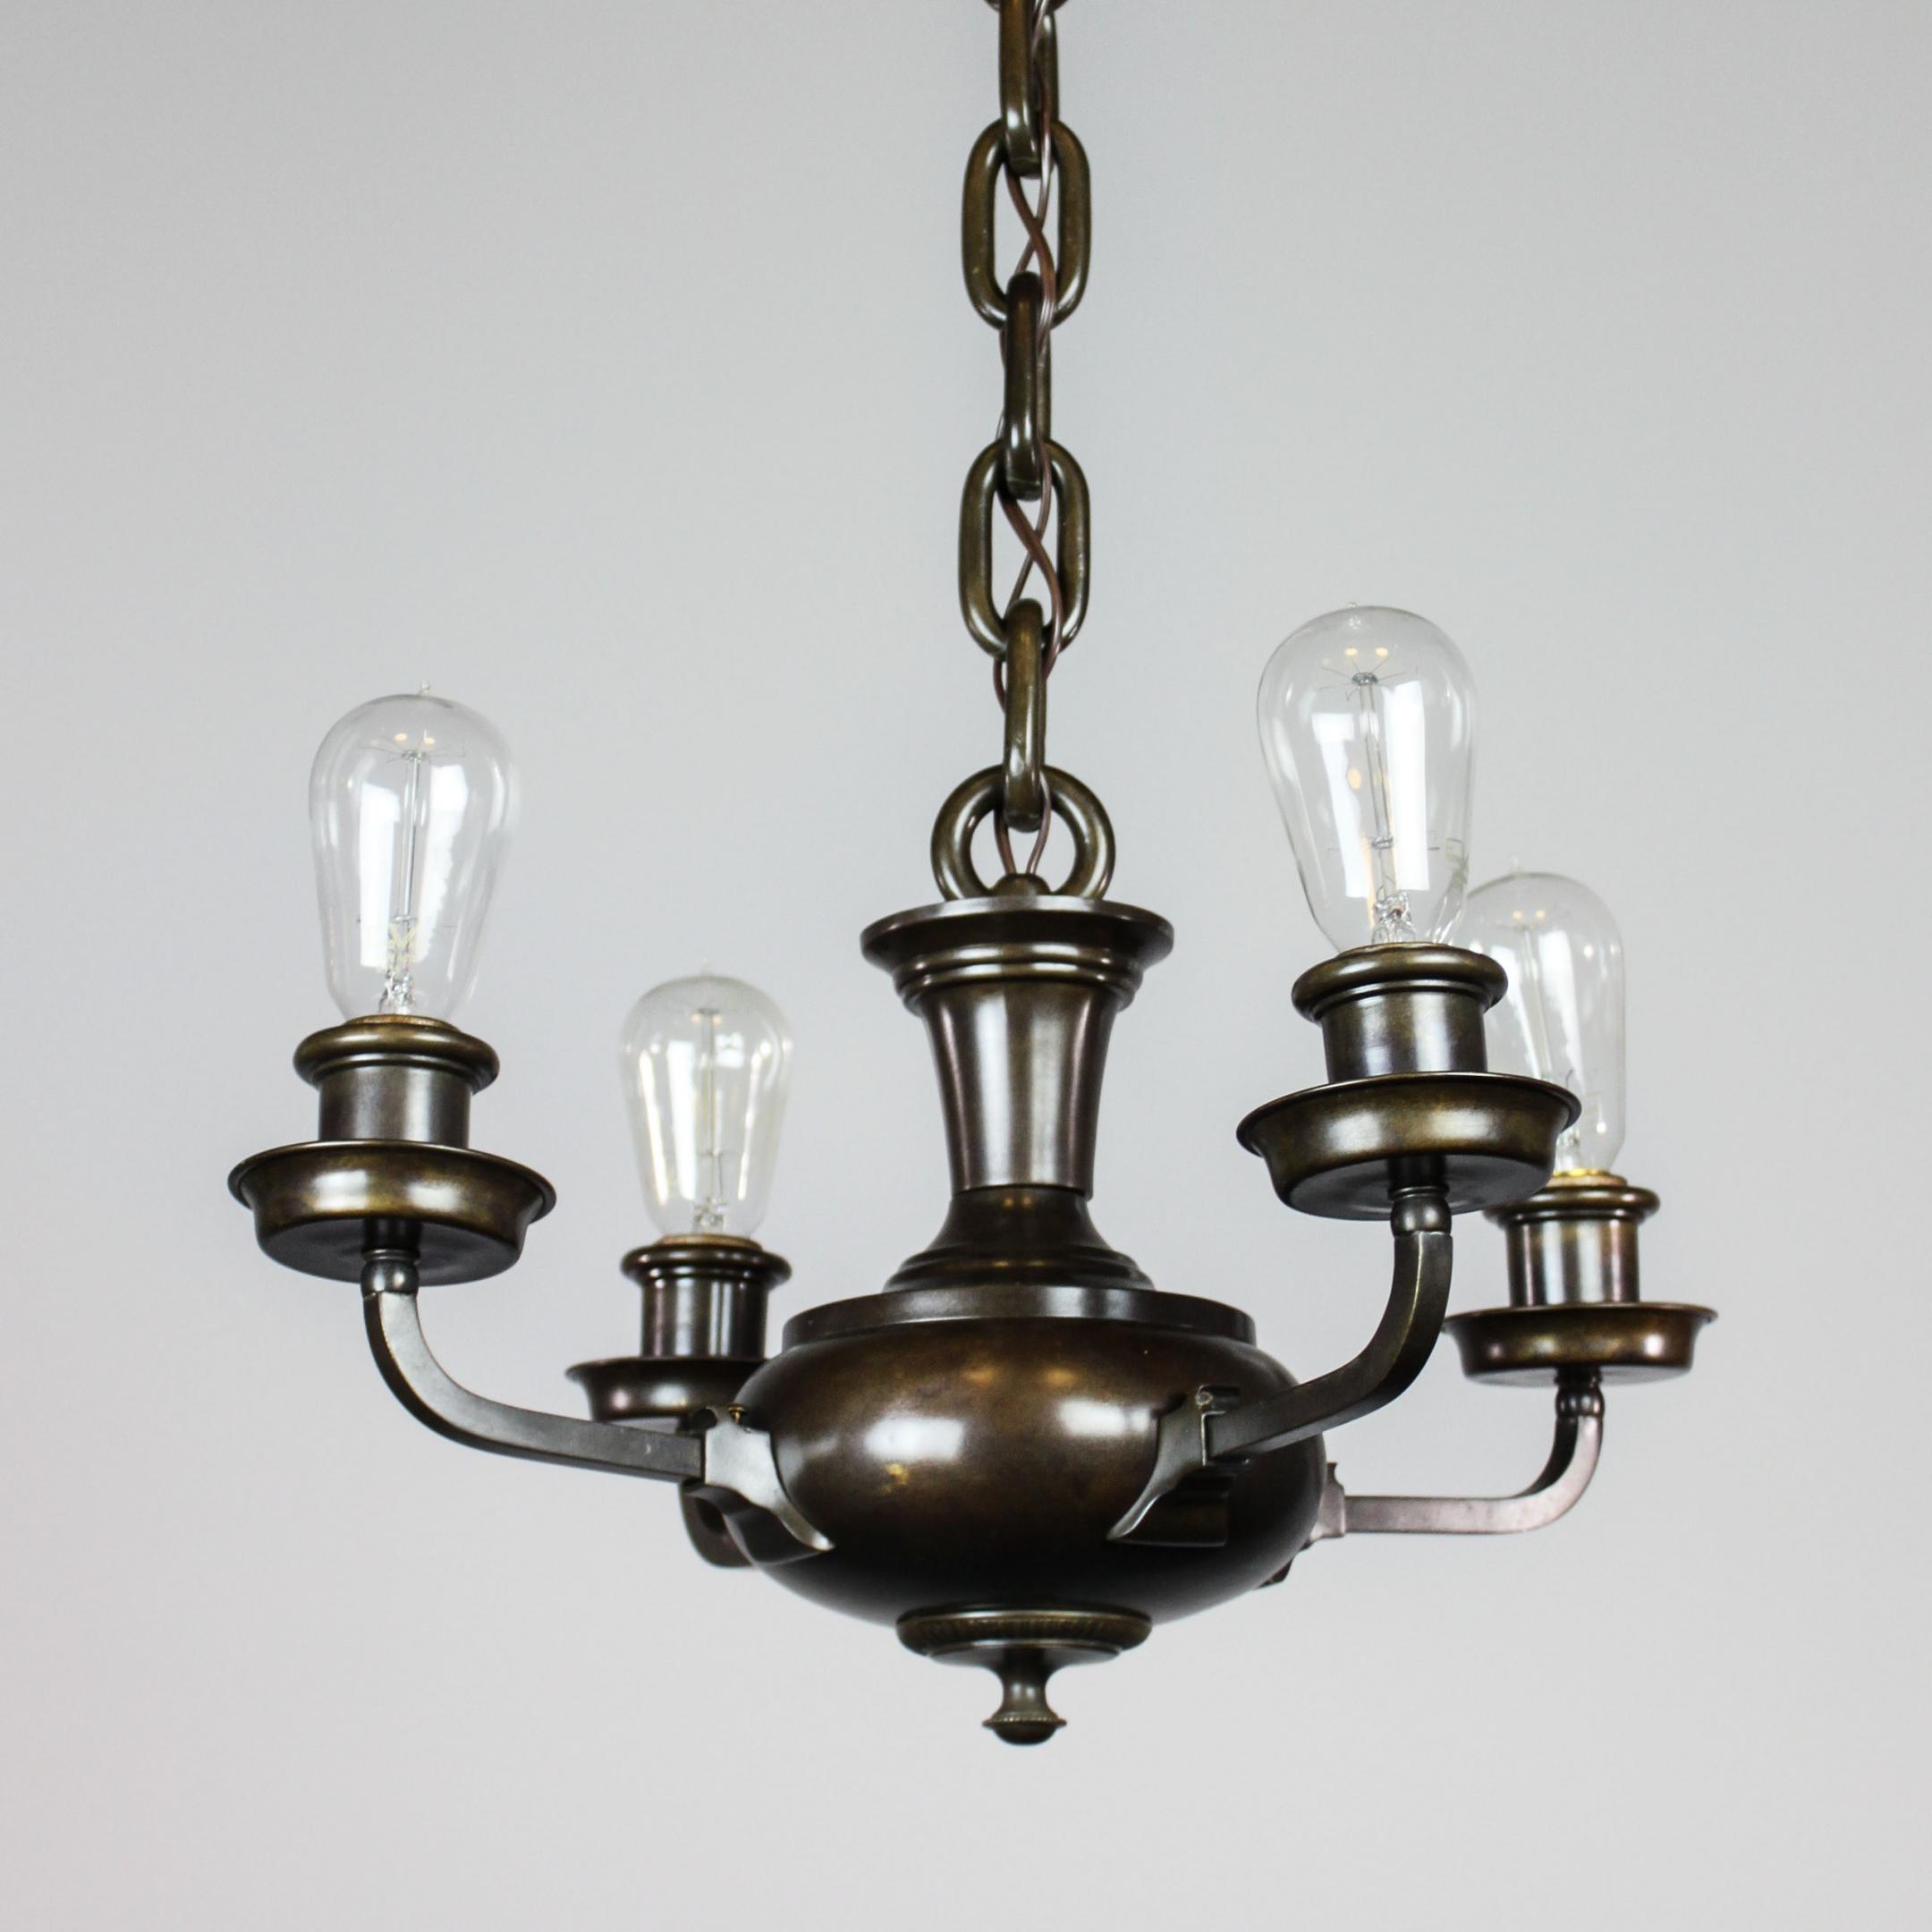 artistic arts crafts bare bulb pan light fixture 4. Black Bedroom Furniture Sets. Home Design Ideas